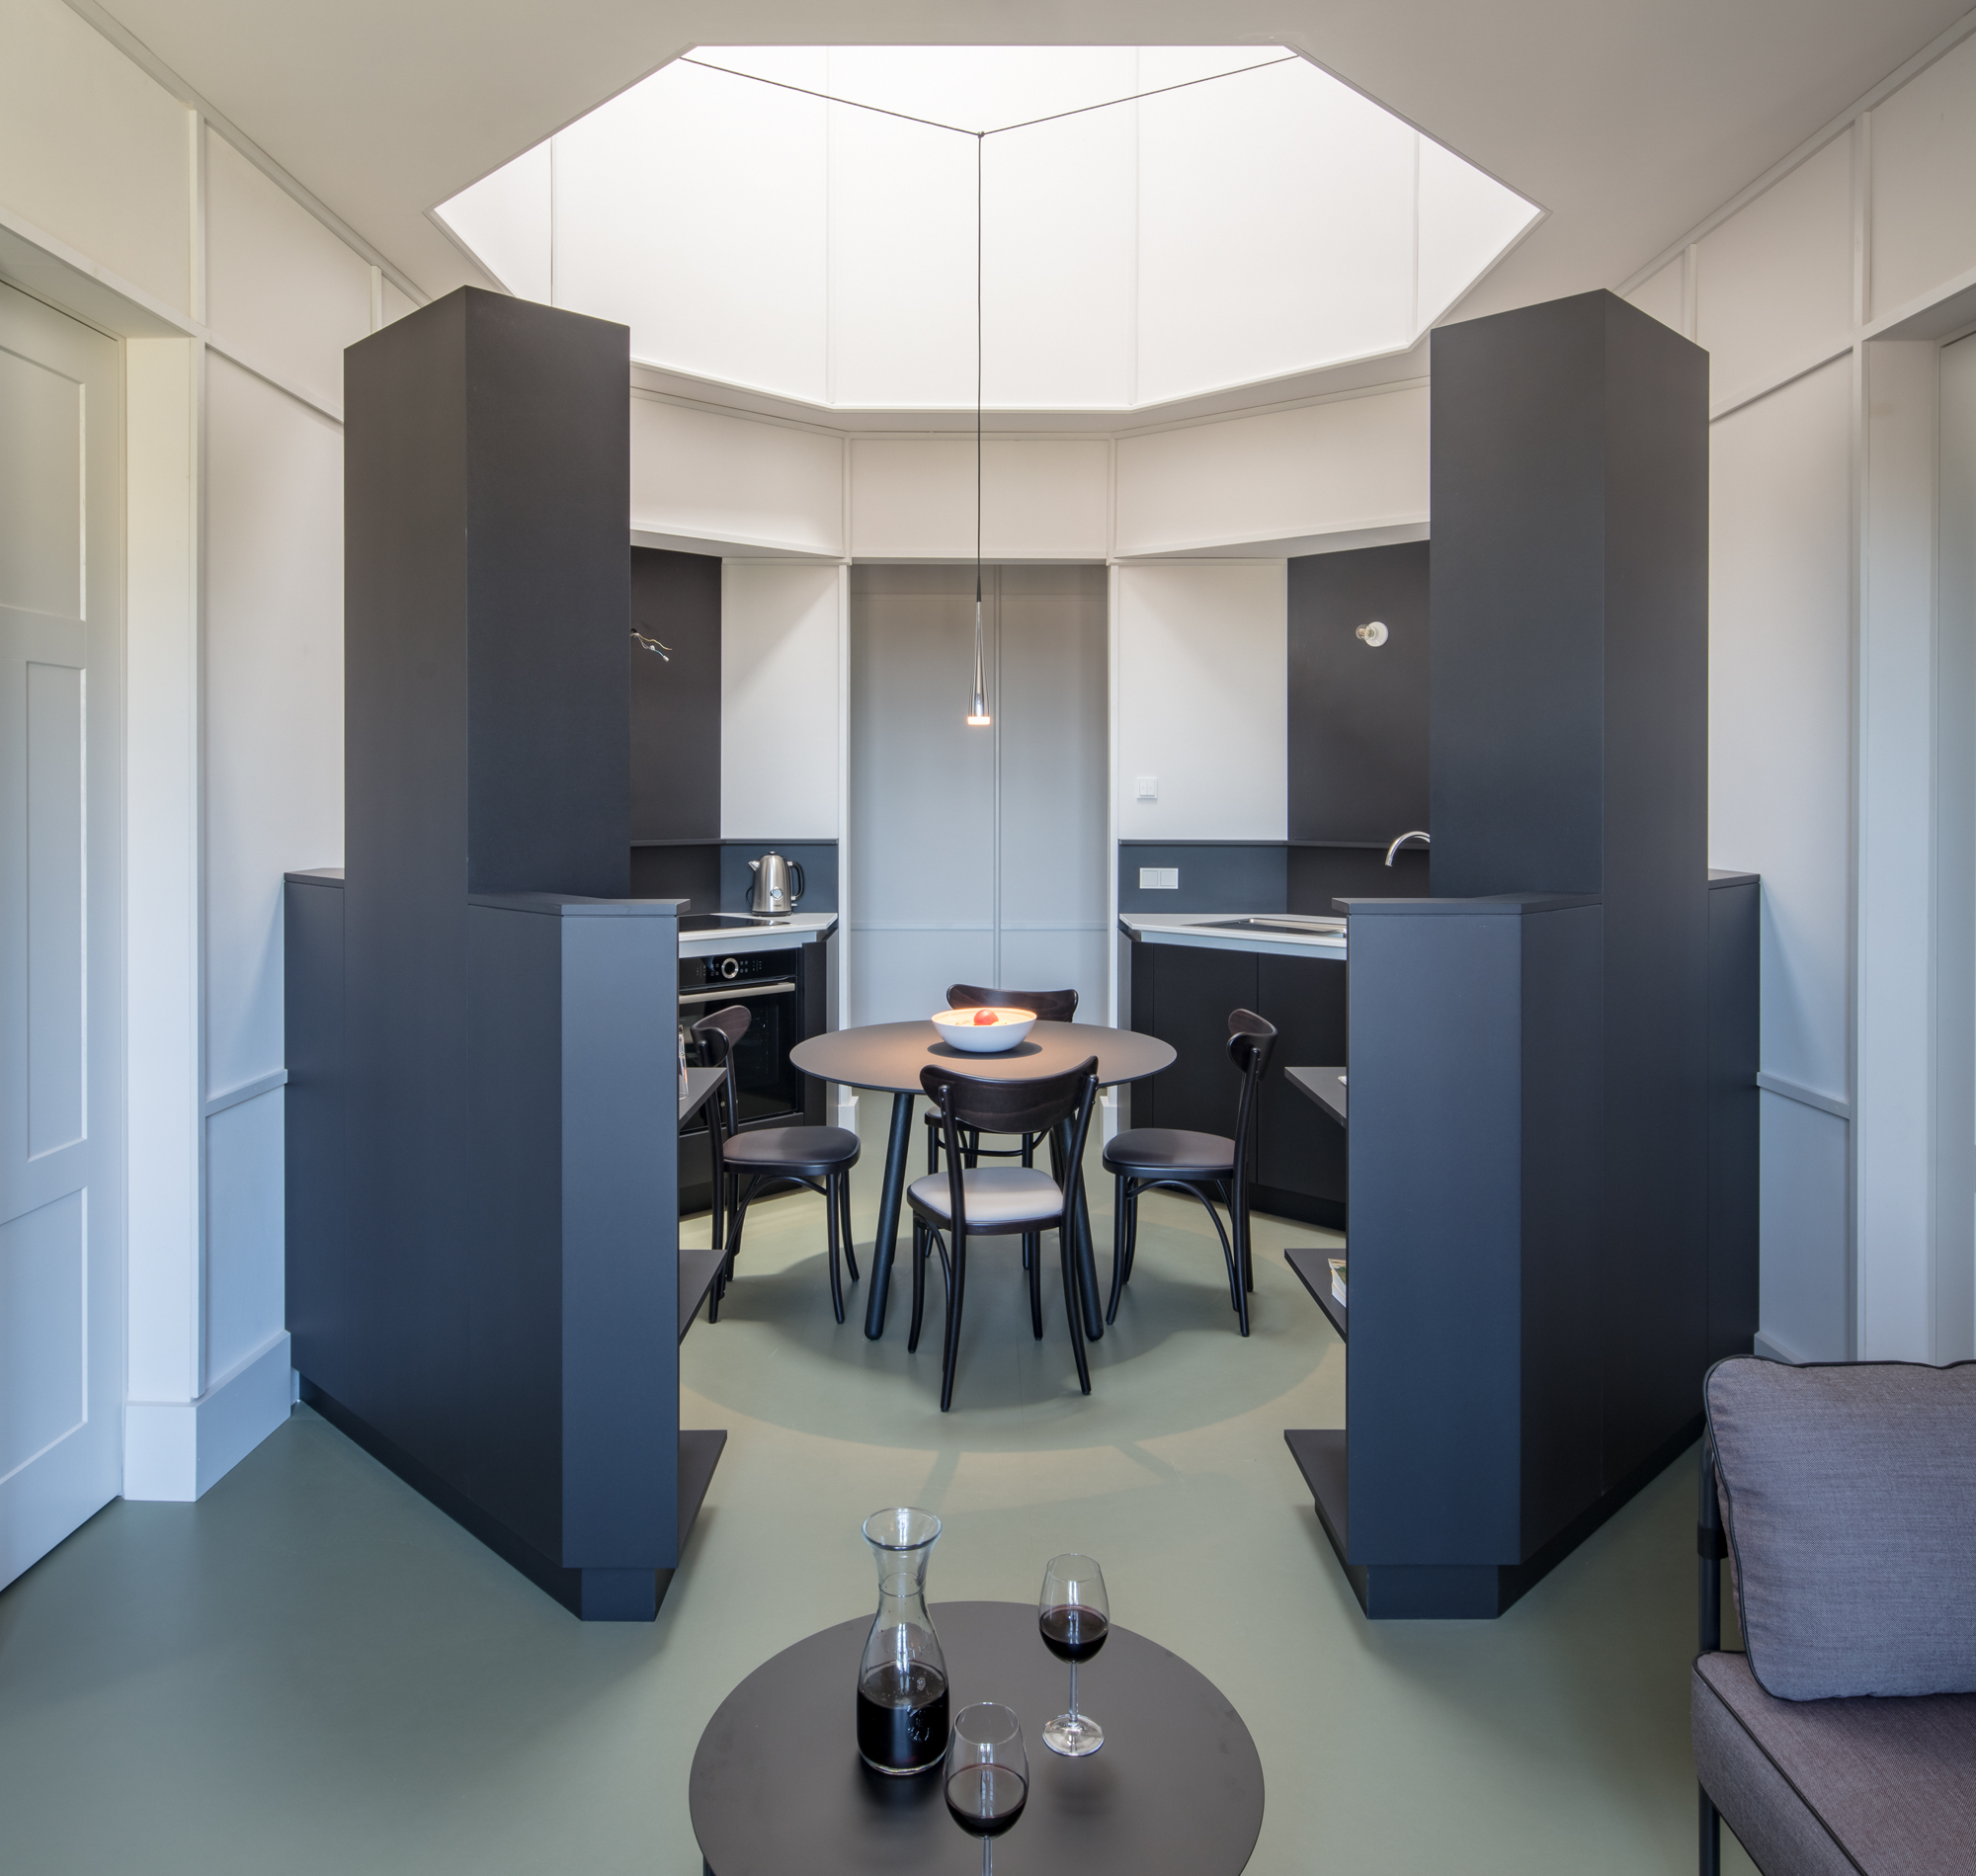 ApartmentHimmelszelt, 53 Quadratmeter. Foto: Till Schuster